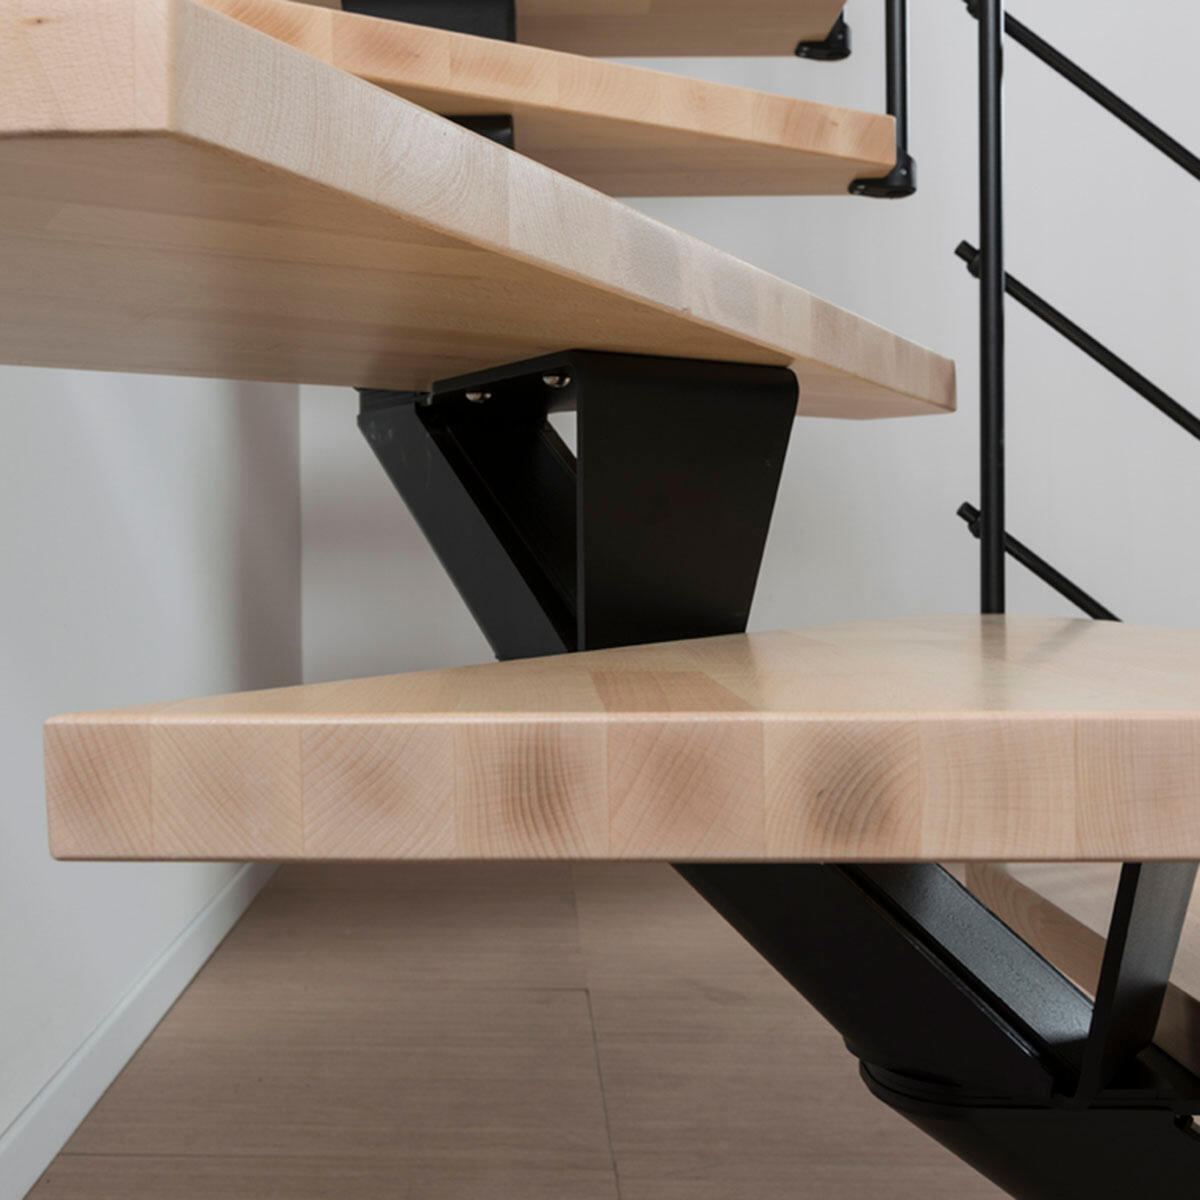 Scala a rampa 1/4 di giro Mas 050 PVC FONTANOT L 75 cm, gradino naturale, struttura nero - 9